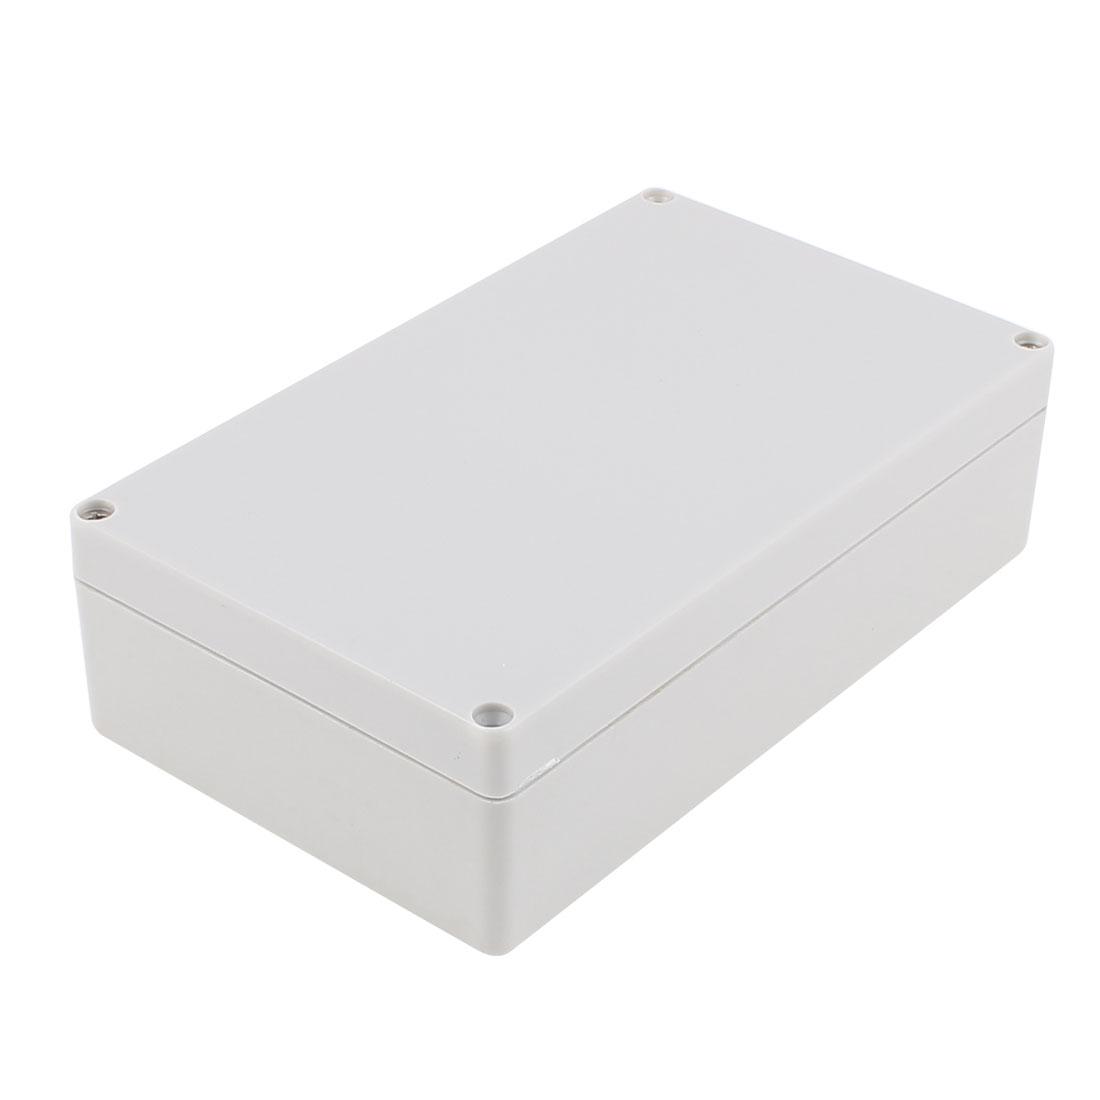 200 x 120 x 56mm Dustproof IP65 Junction Box Terminal Connecting Box Enclosure